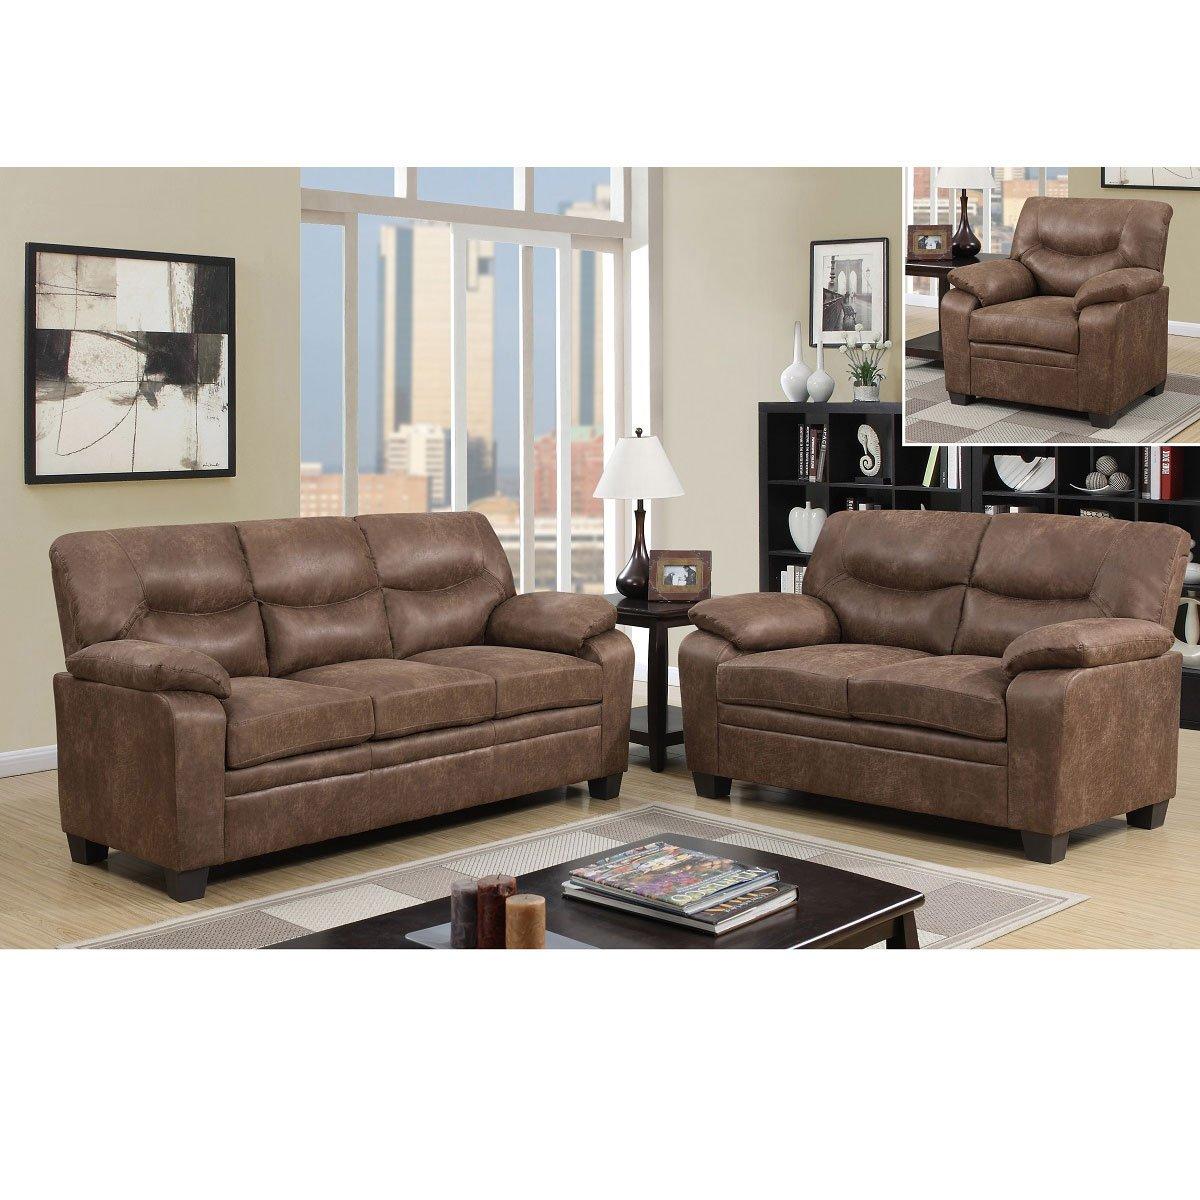 Sala Viena 3 2 Sof Y Love Seat U880028 Global Furniture Sears  # Muebles Liz Sears